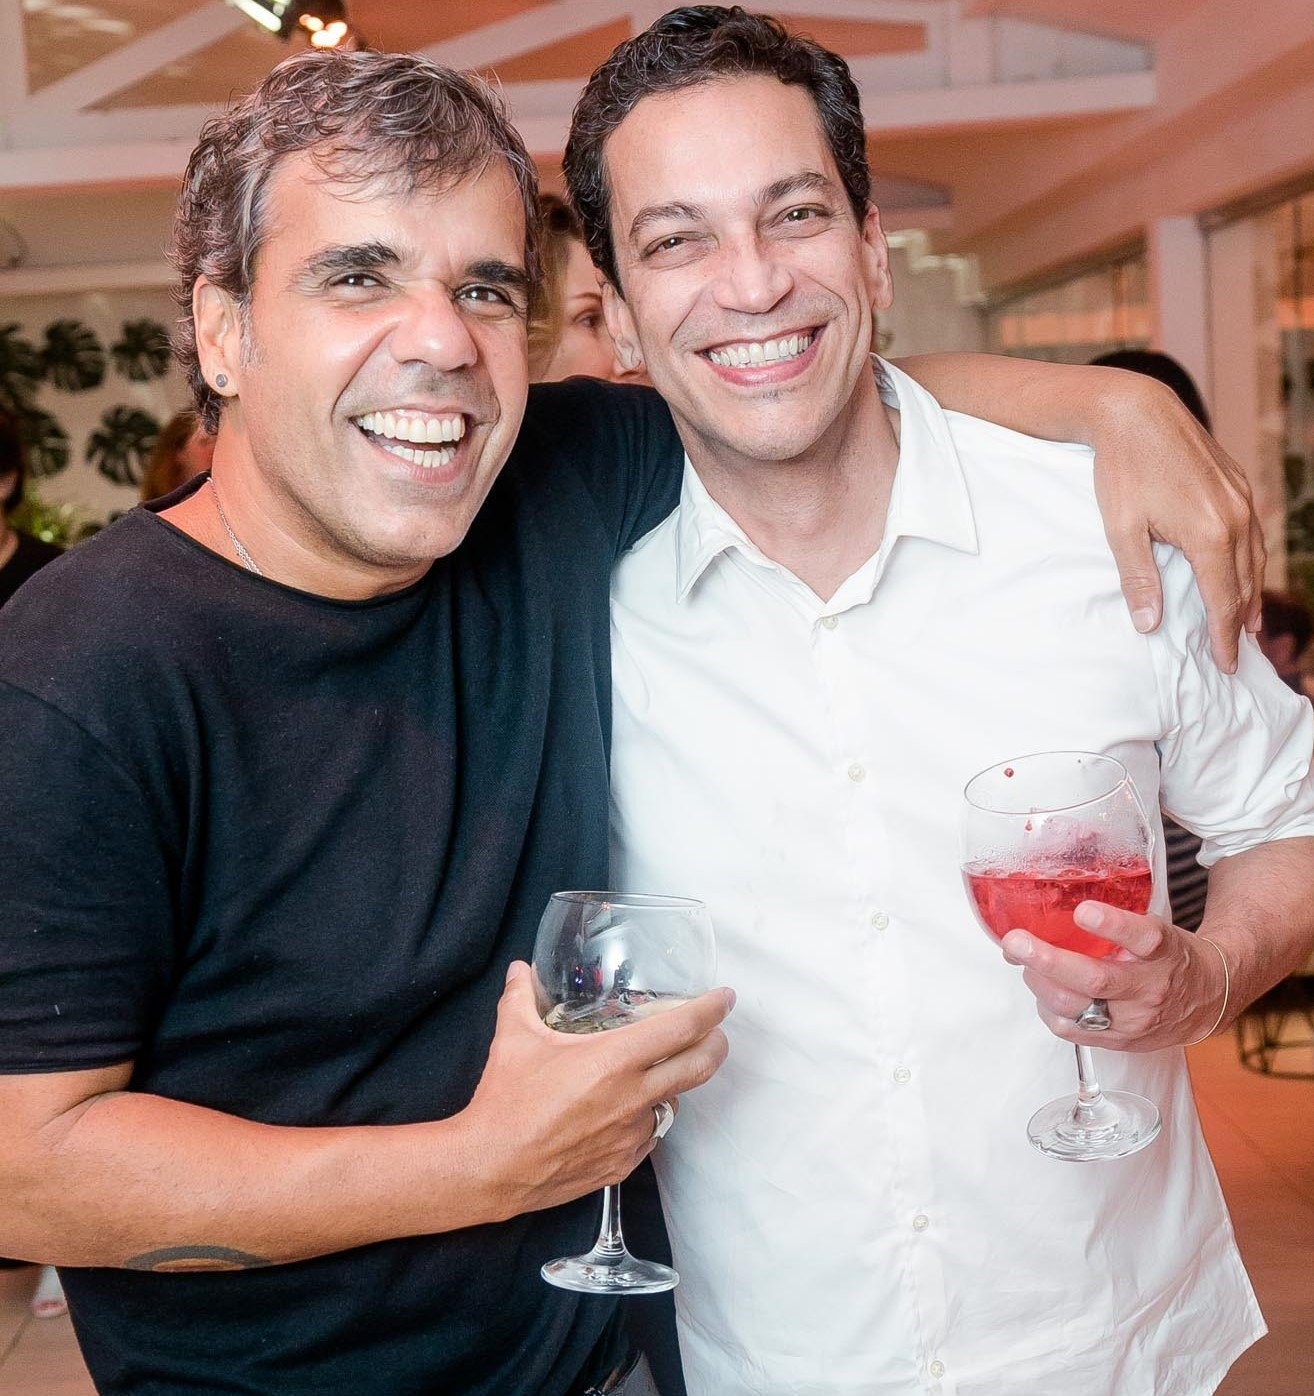 Evandro Rius e Luiz Mena Barreto  /Foto: Miguel Sá